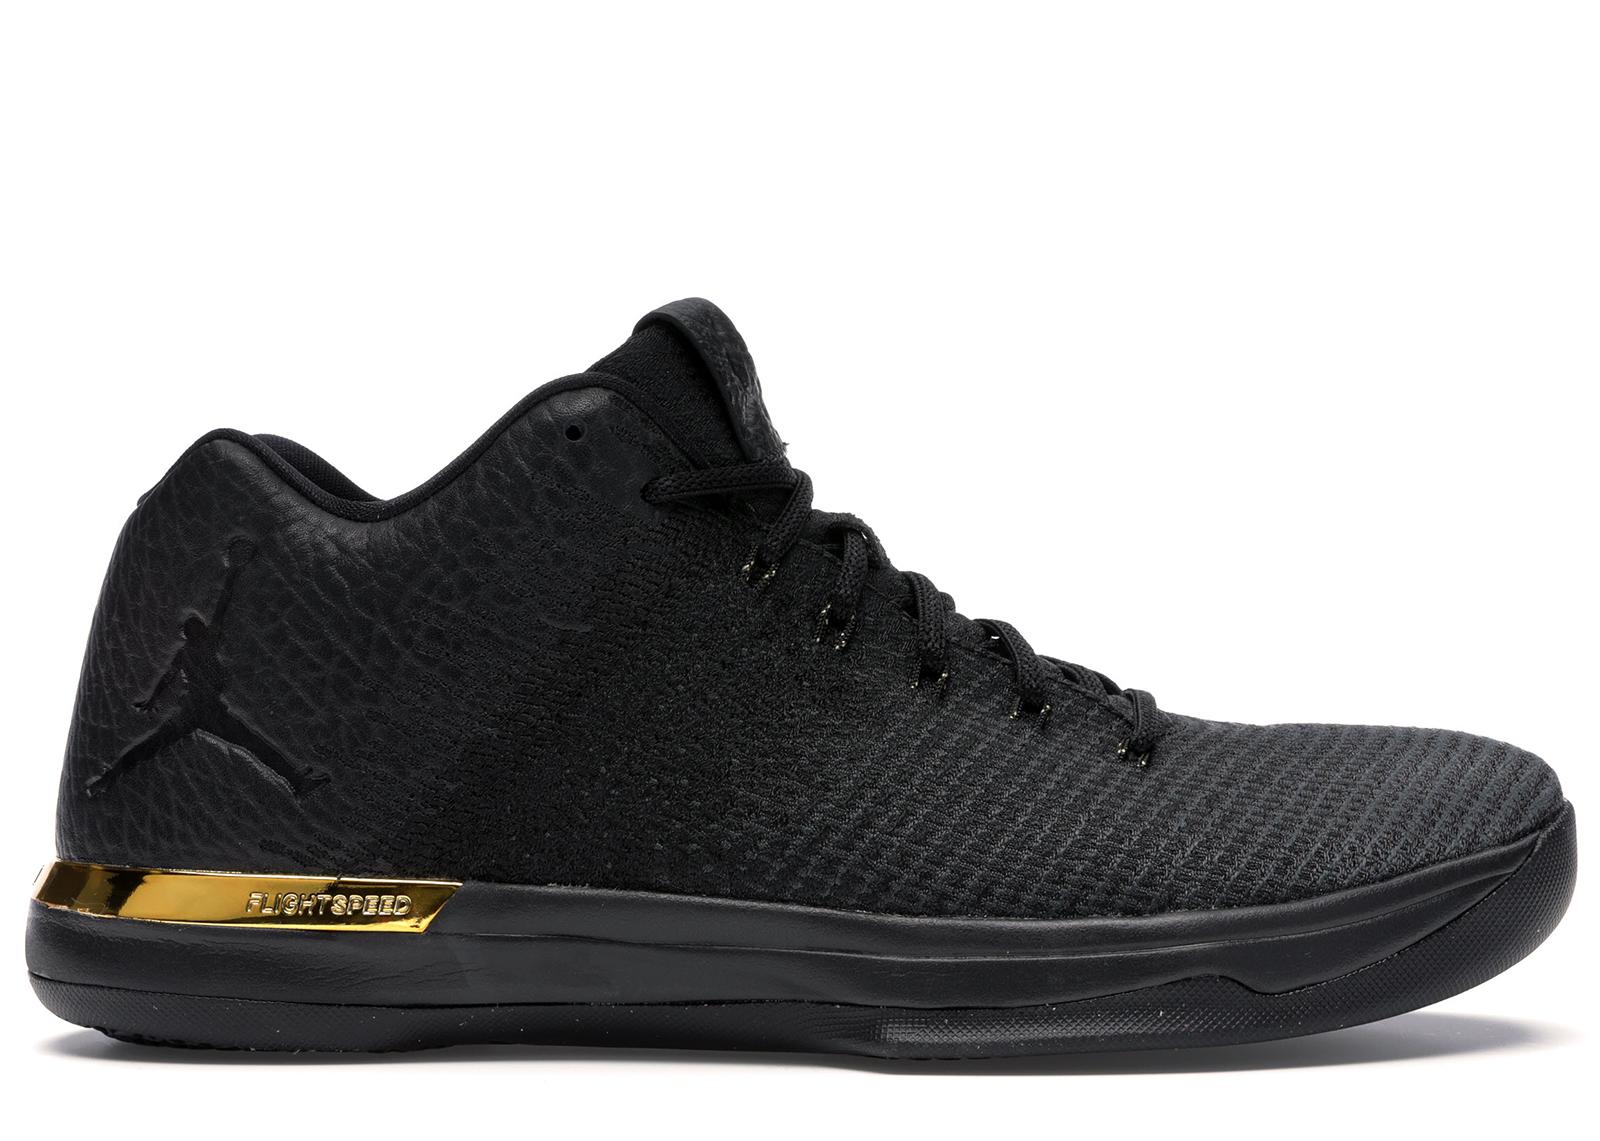 Jordan XXX1 Low Black Gold - 897564-023